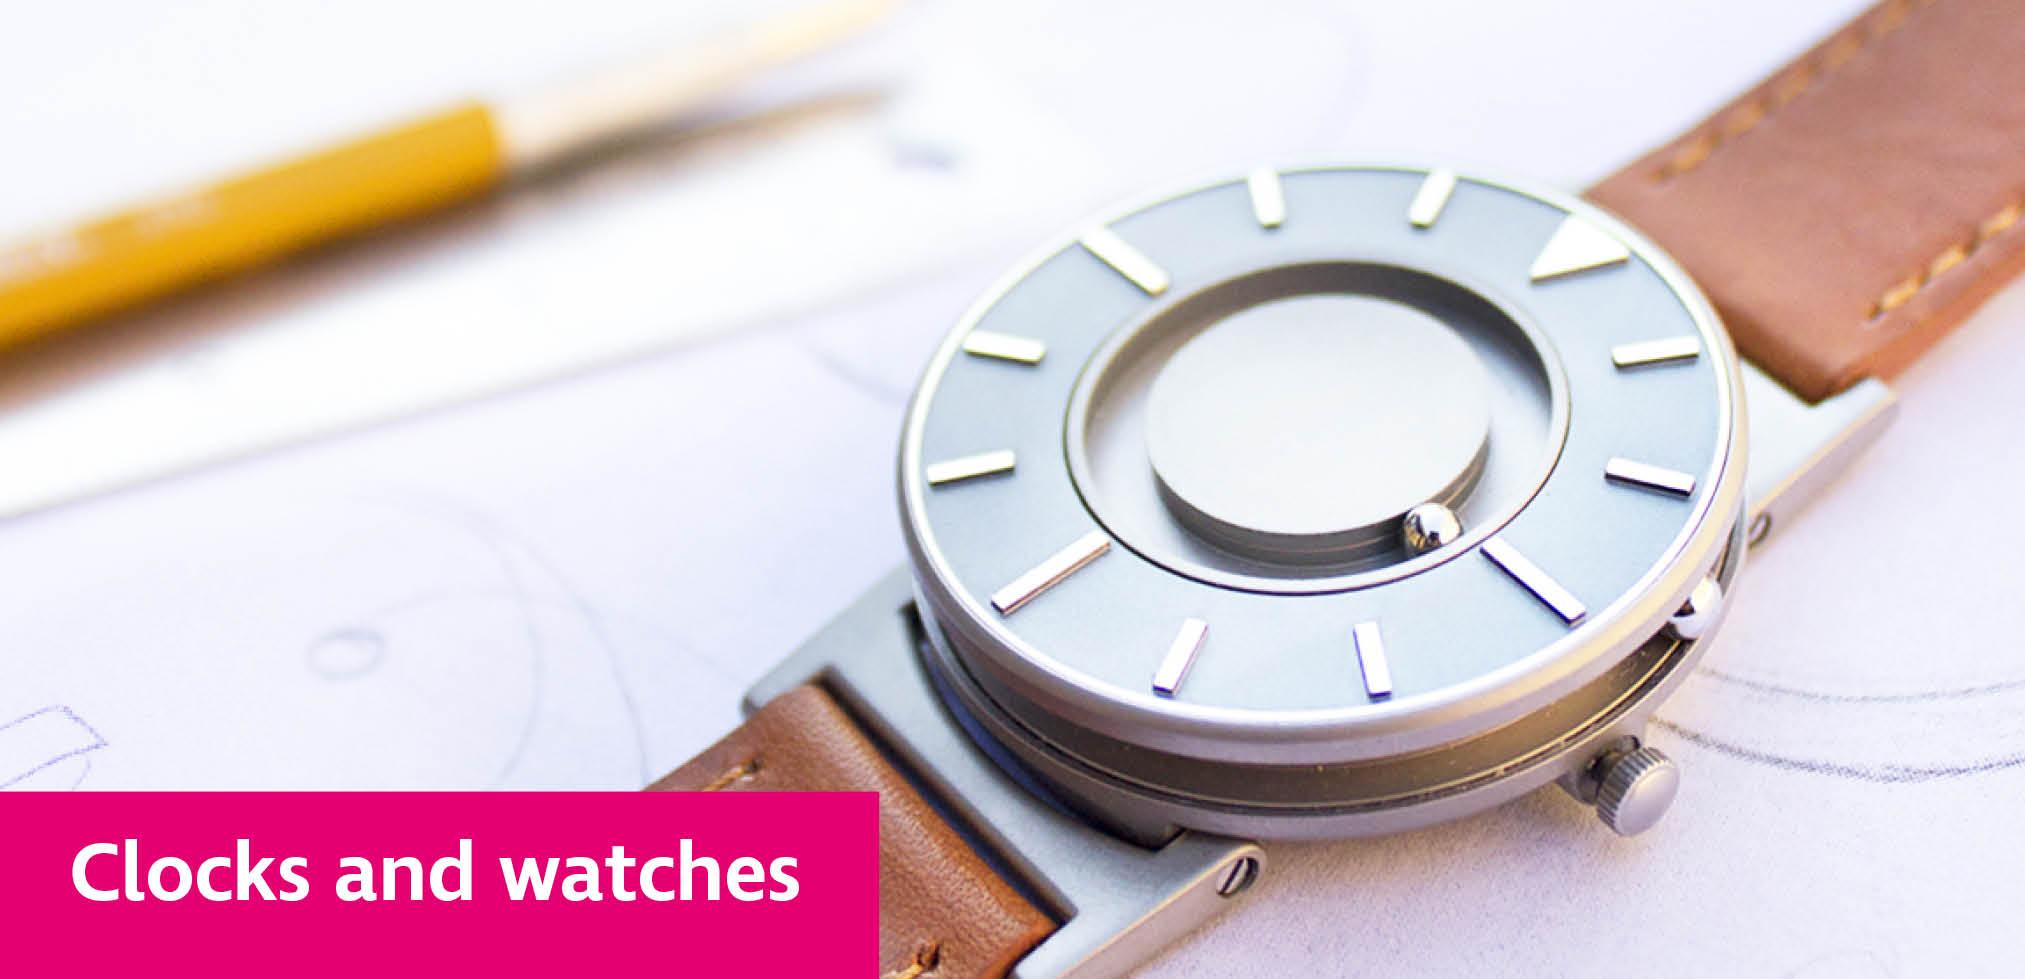 Bradley tactile watch on a desk